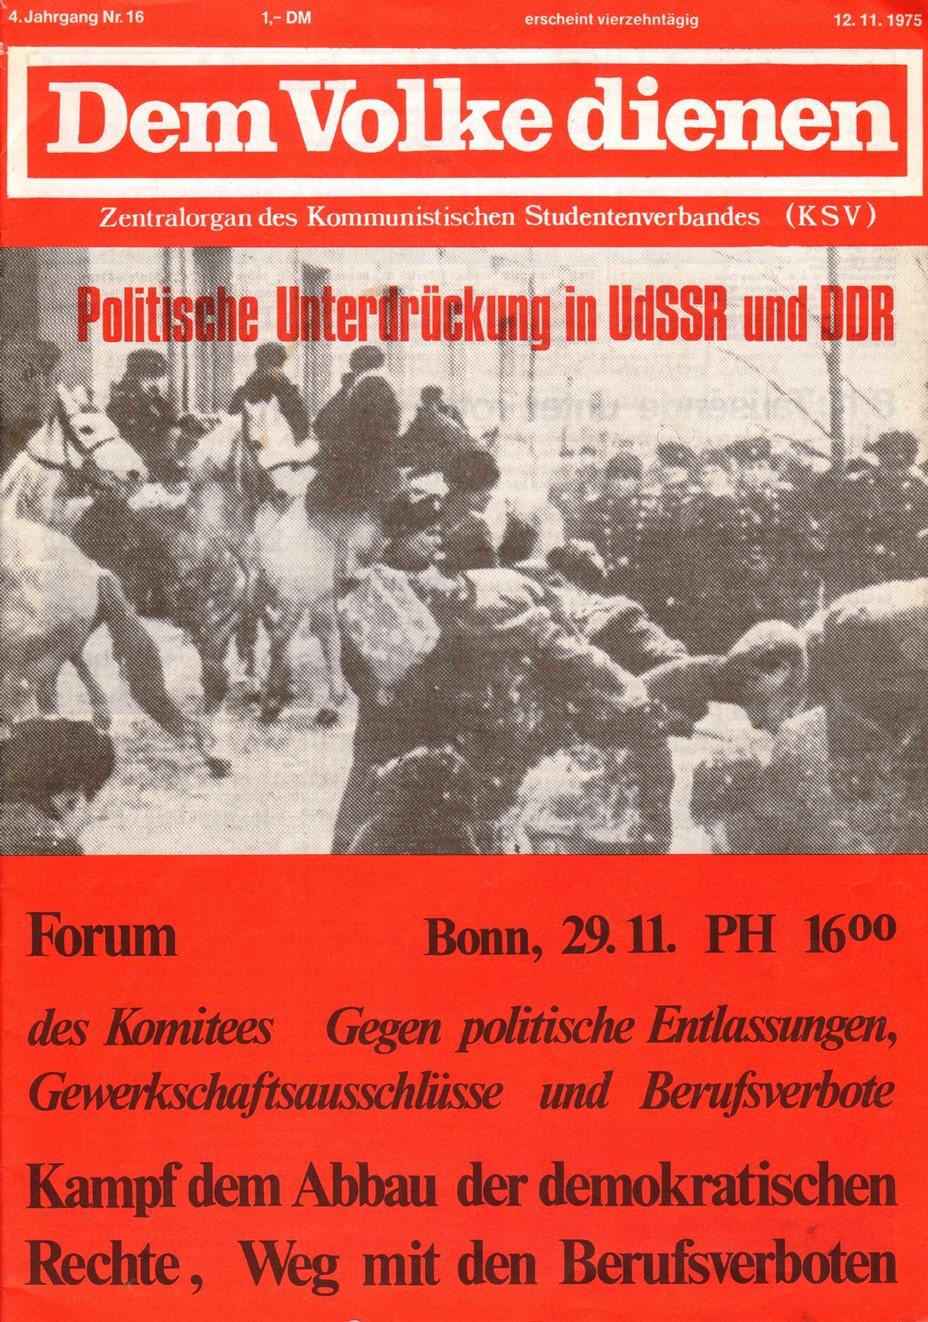 Koeln_KSV_DVD_19751112_01